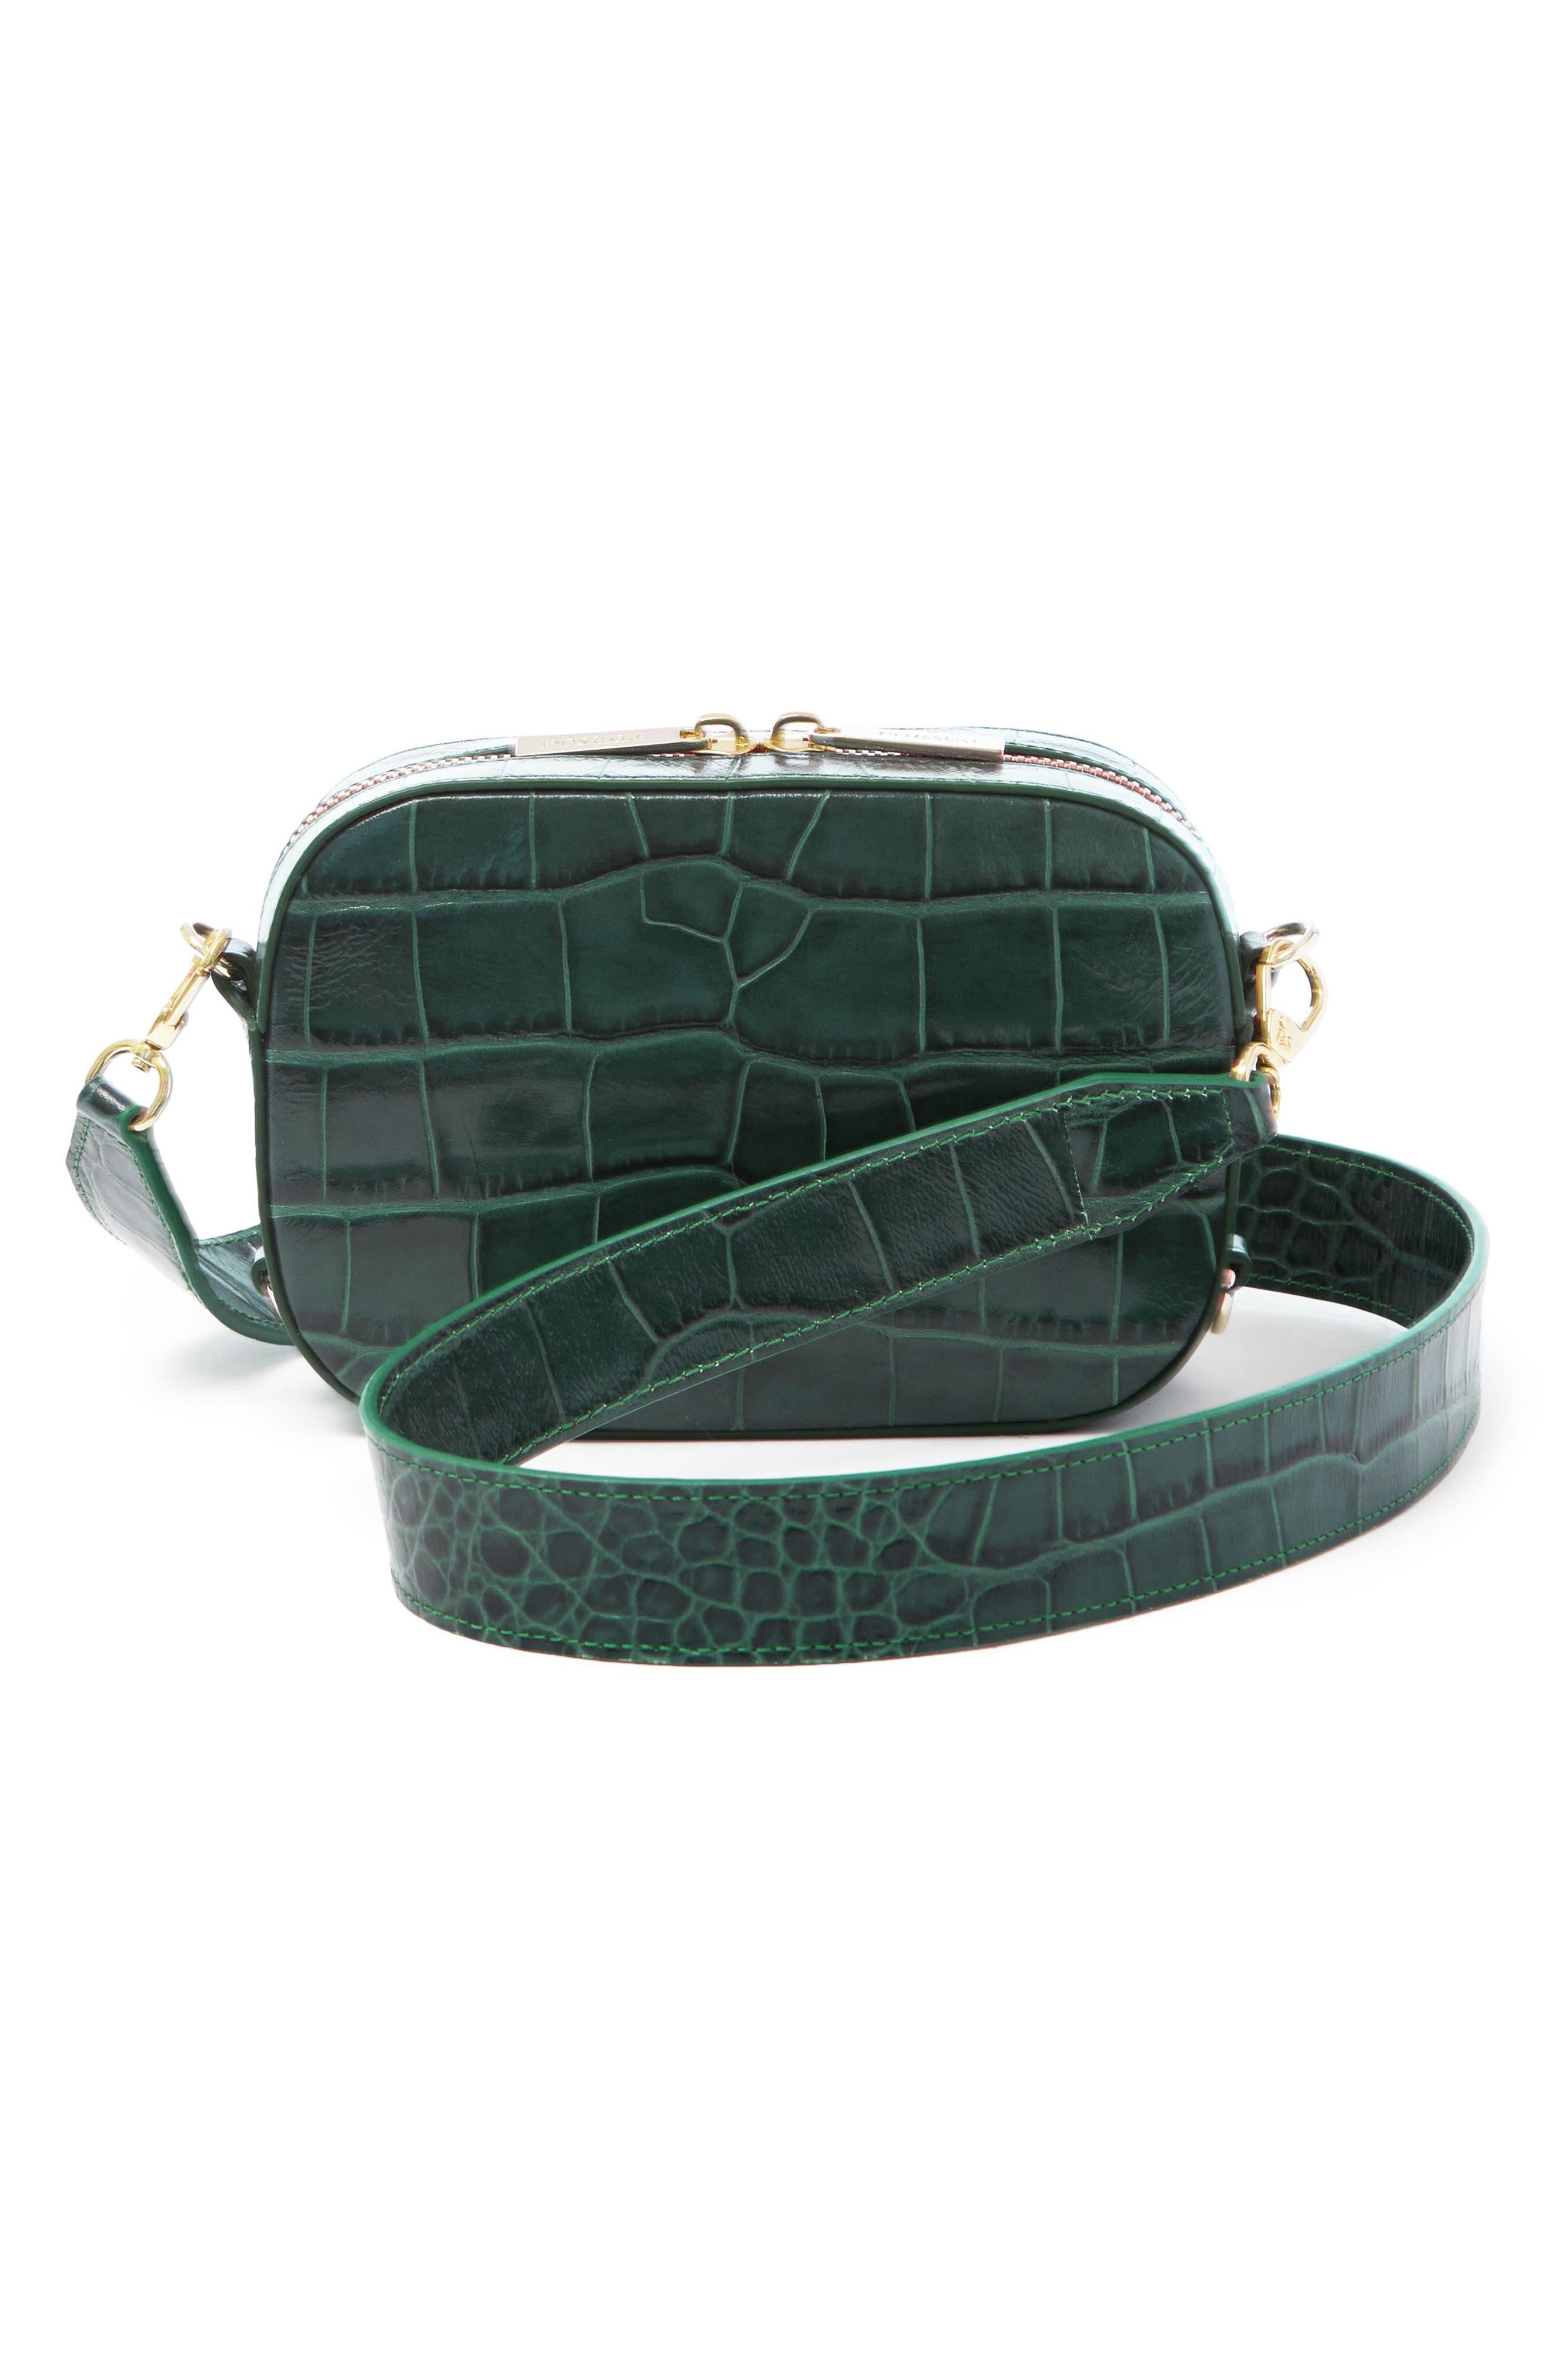 Alternate Image 1 Selected - Pop & Suki Croc Embossed Camera Bag (Nordstrom Exclusive)